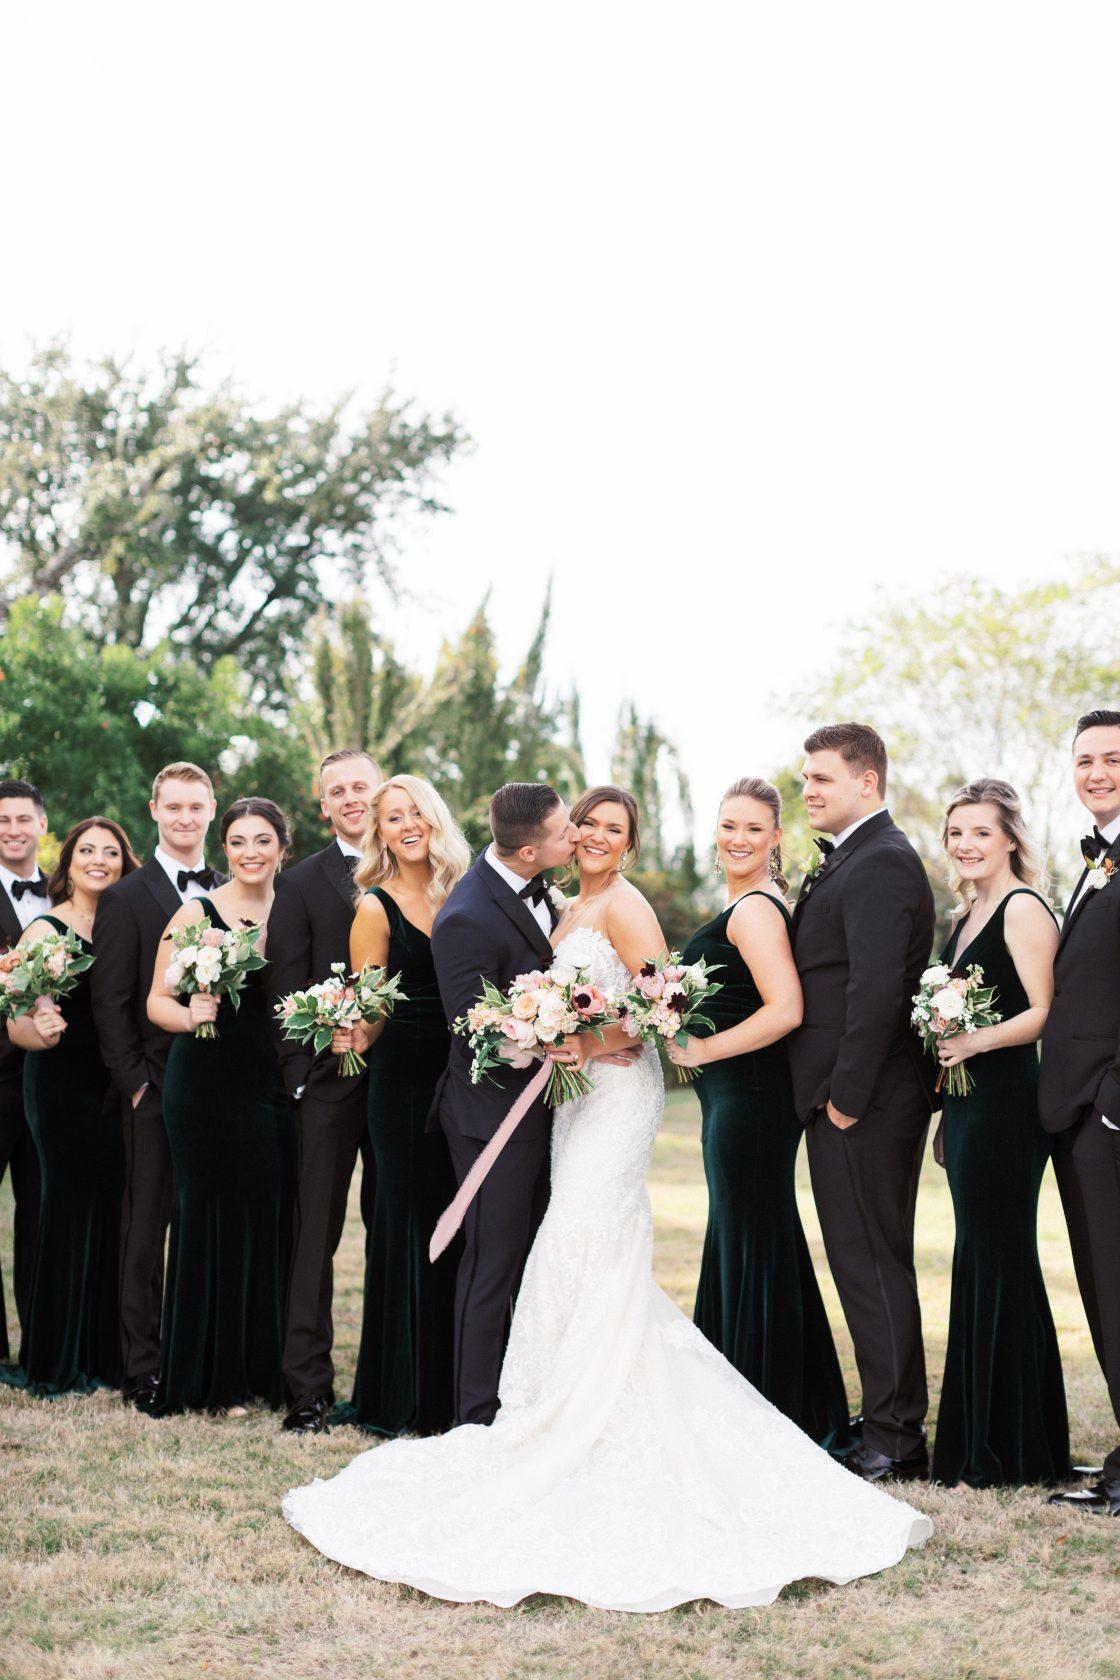 Dark Elegant Bridal Party